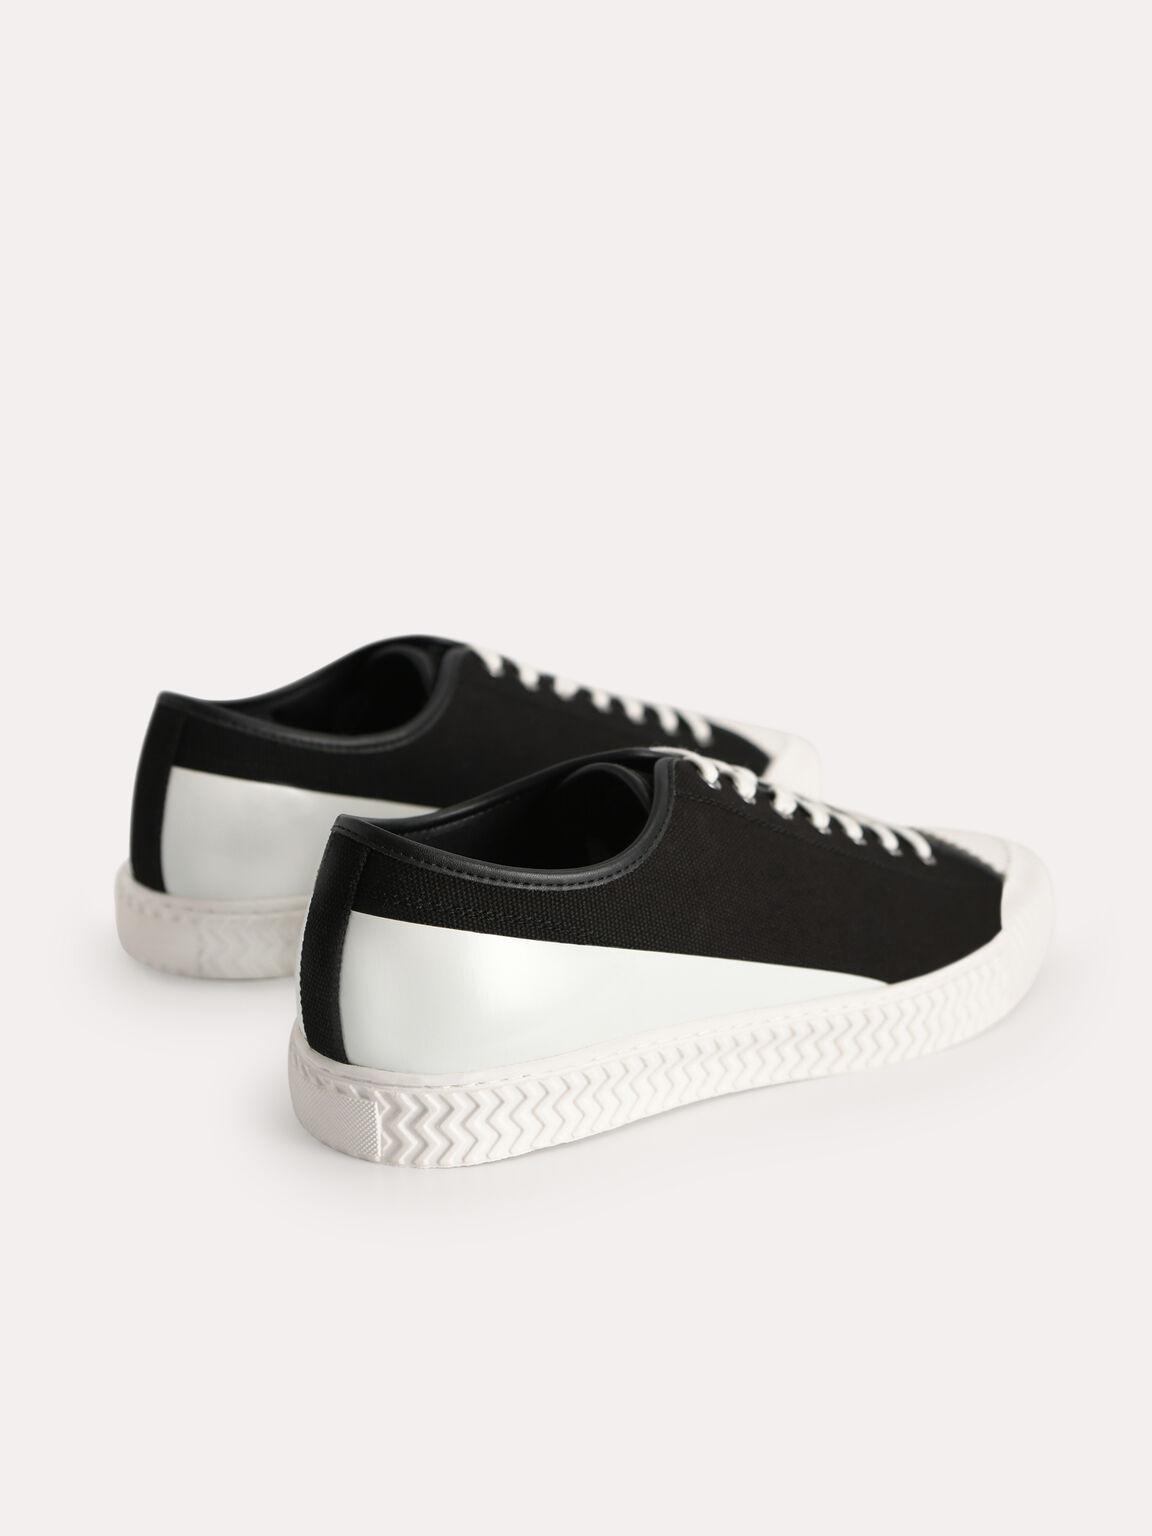 rePEDRO Organic Cotton Lace-up Sneaker, Black, hi-res